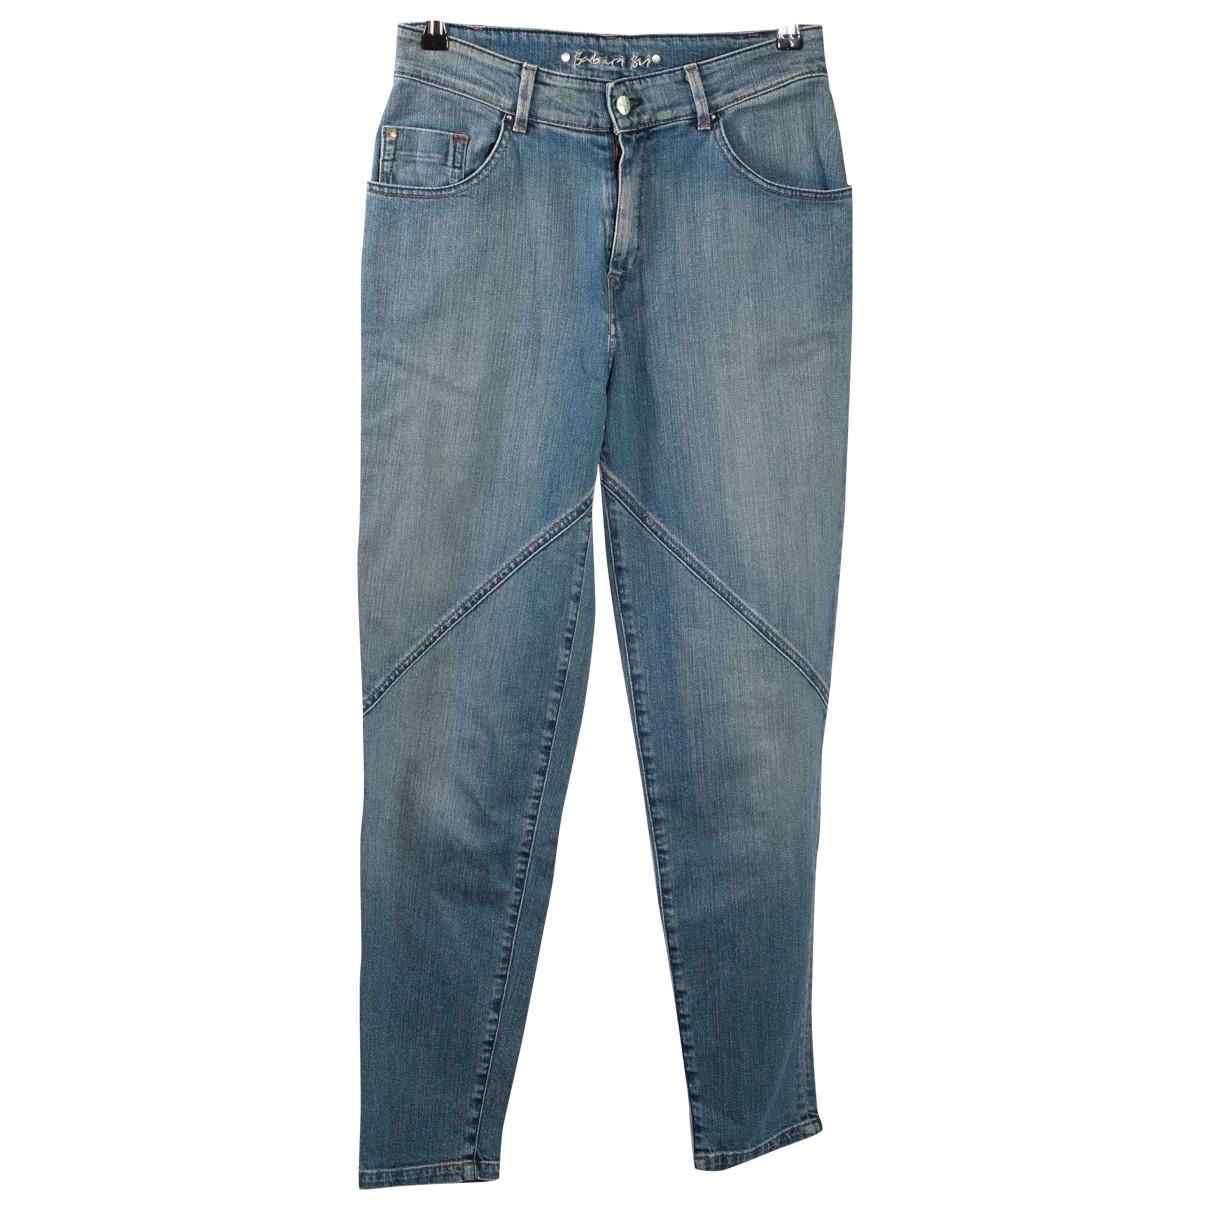 Barbara Bui \N Blue Cotton - elasthane Jeans for Women 26 US